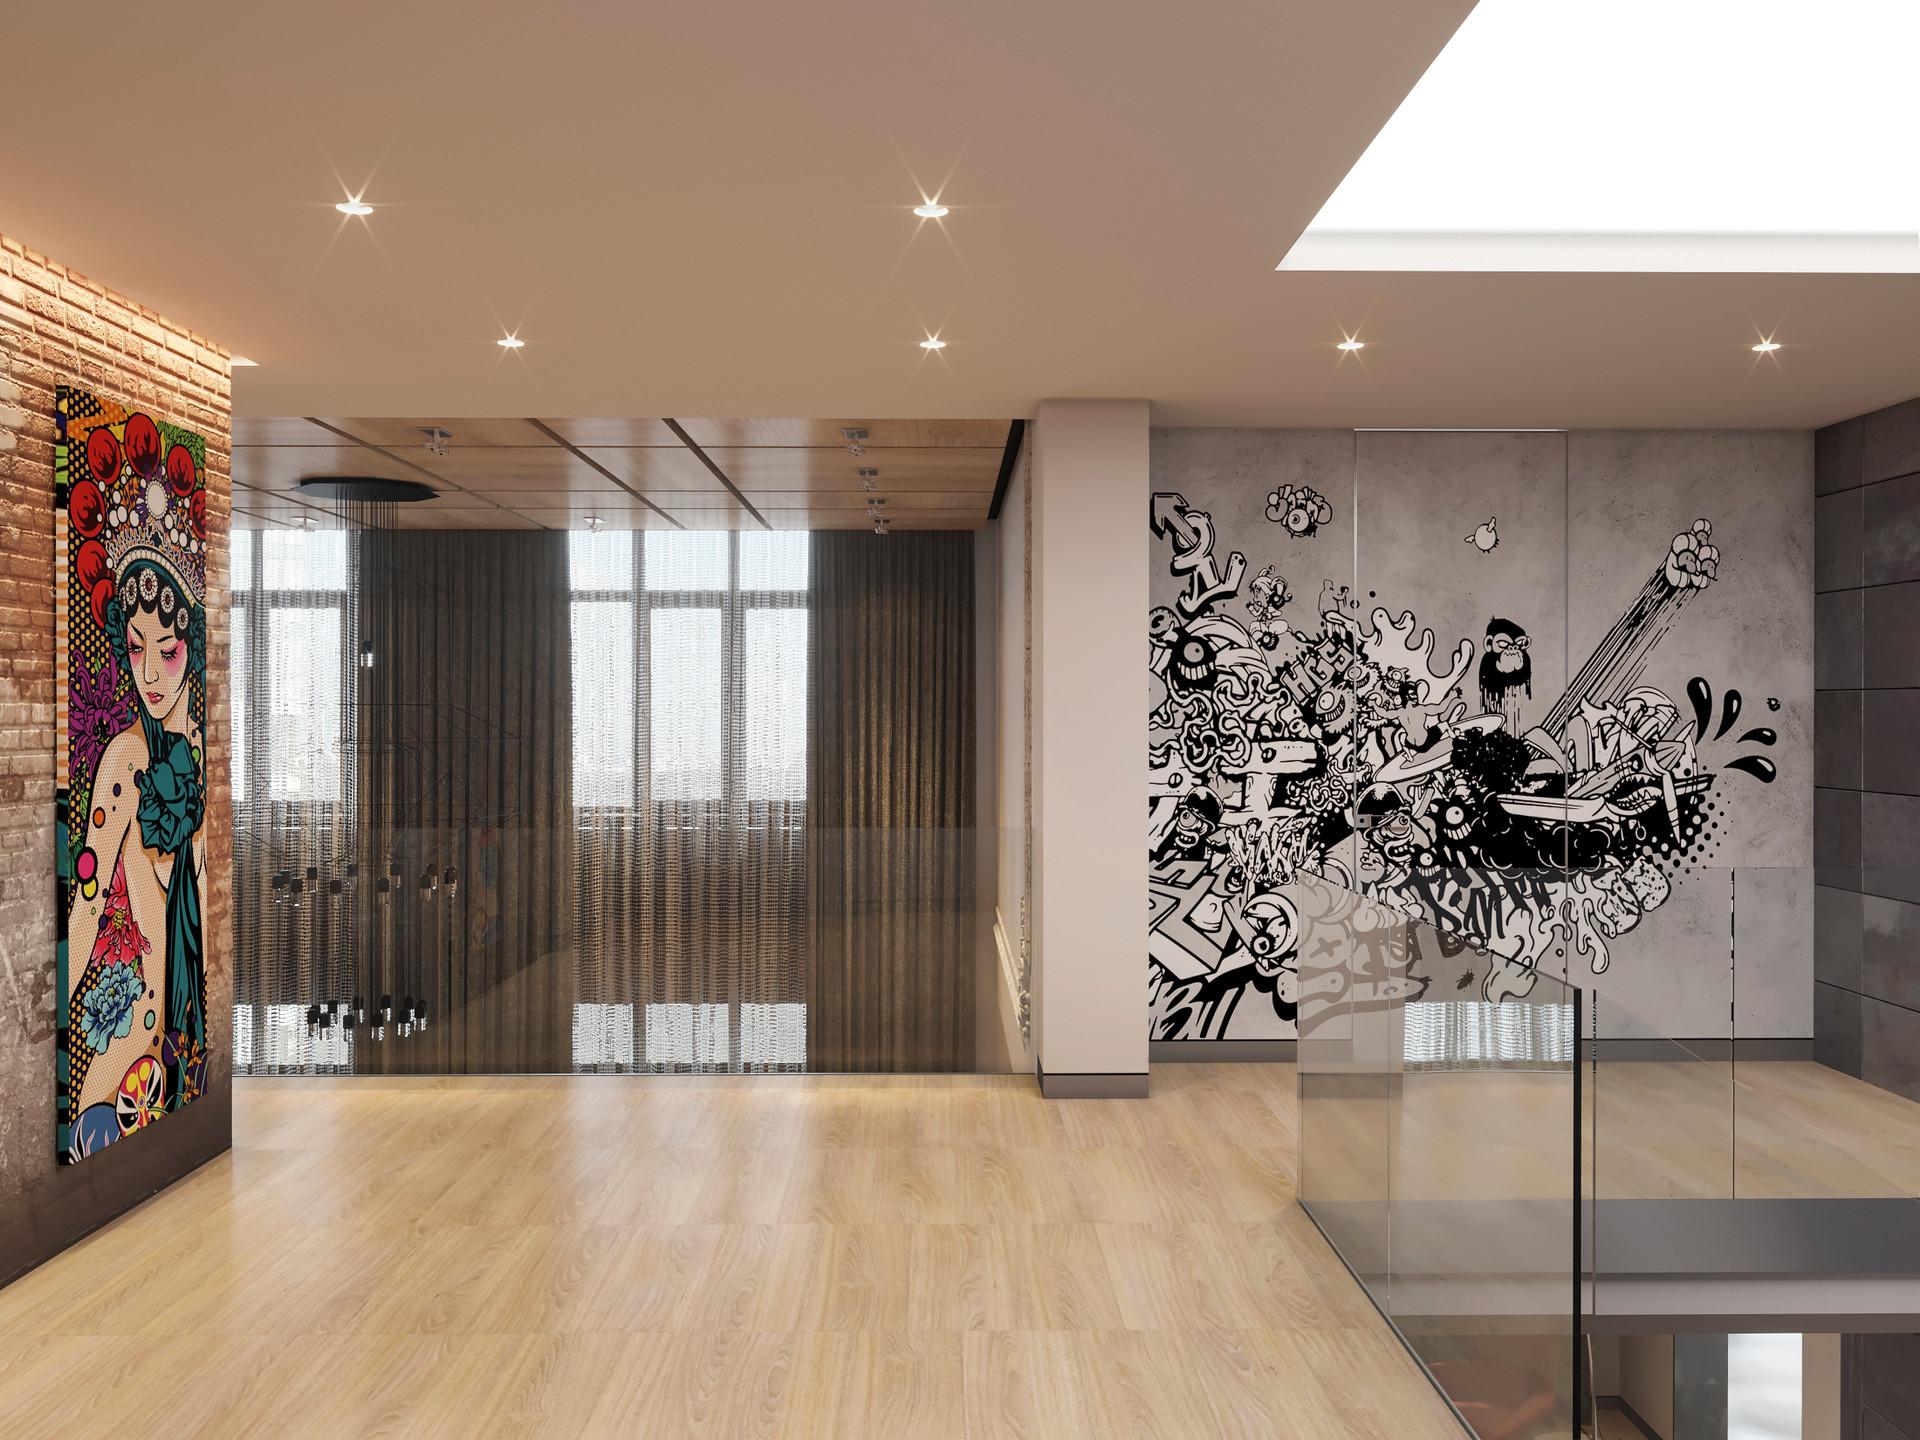 Дизайн интерьера. Современный интерьер